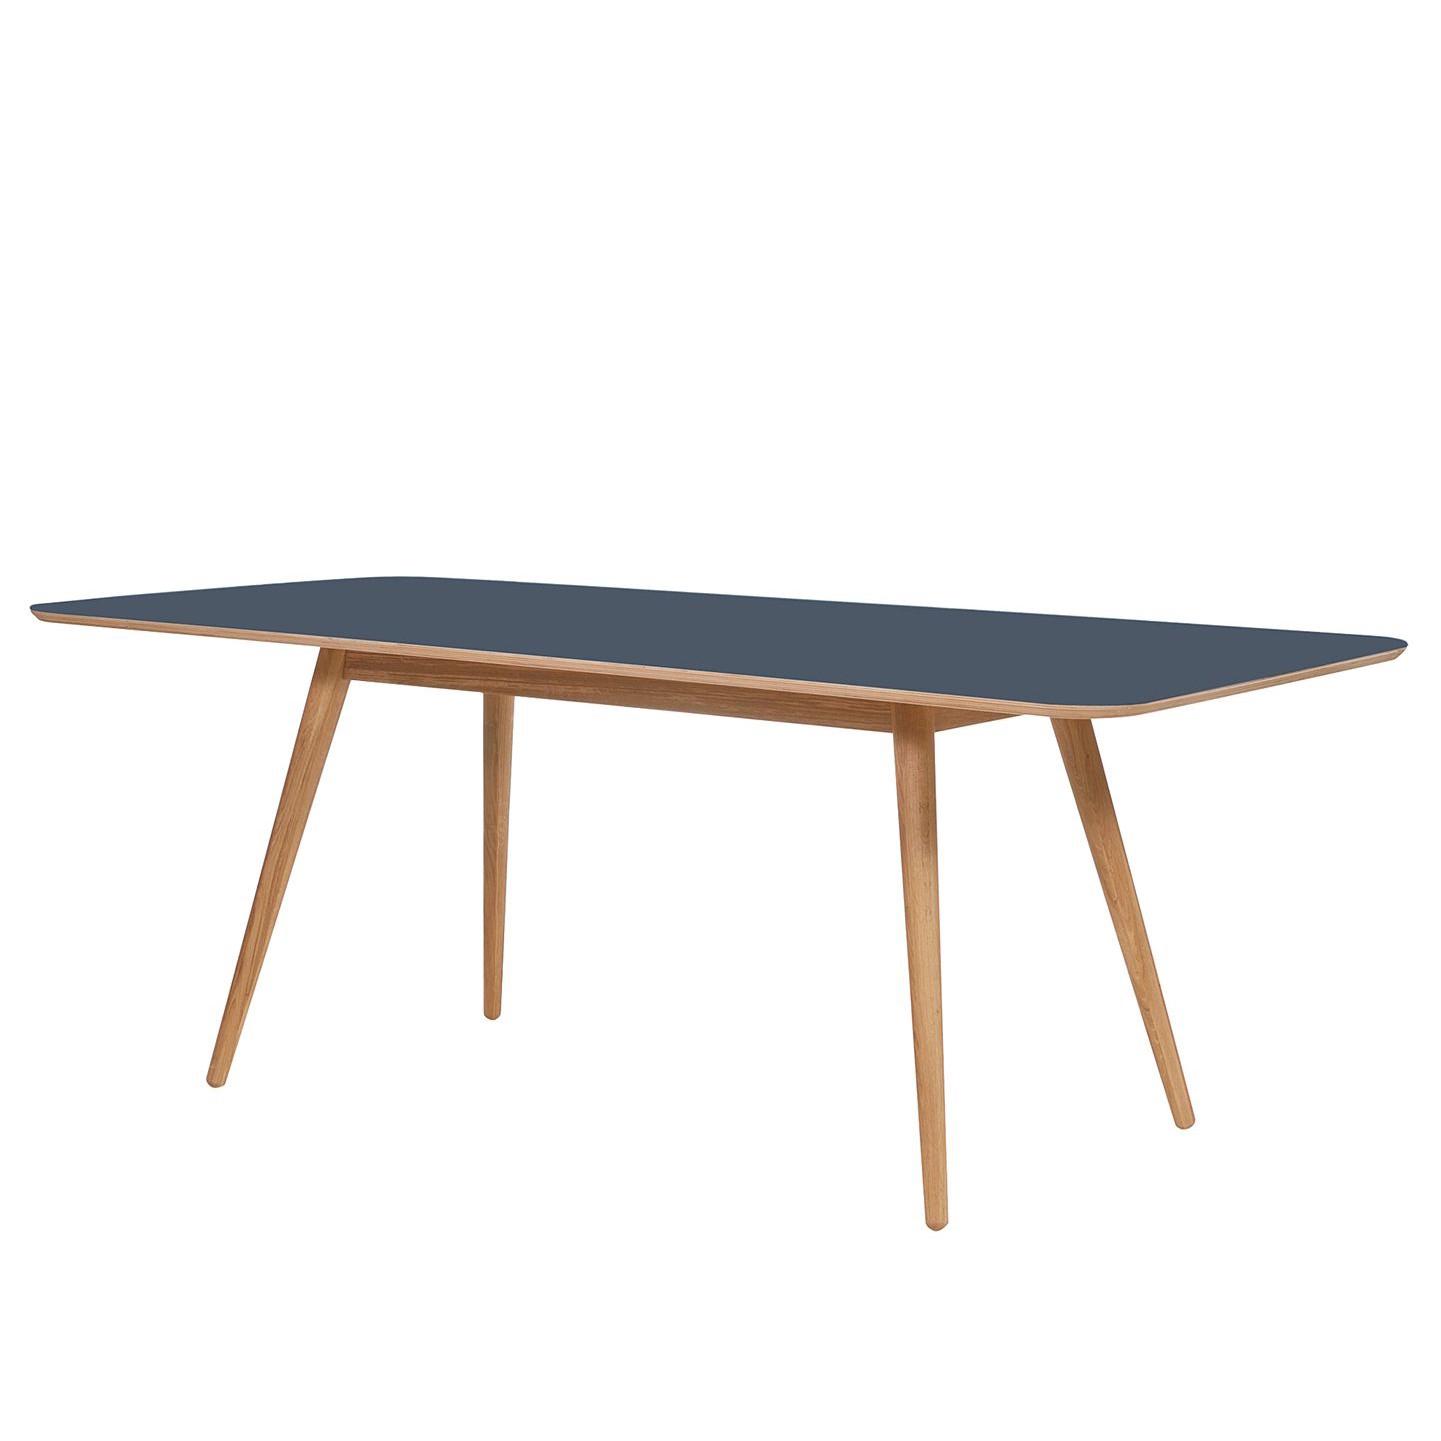 Eettafel Viggo - deels massief eikenhout/linoleum - Petrolblauw/eikenhout - 180x90cm, Studio Copenhagen